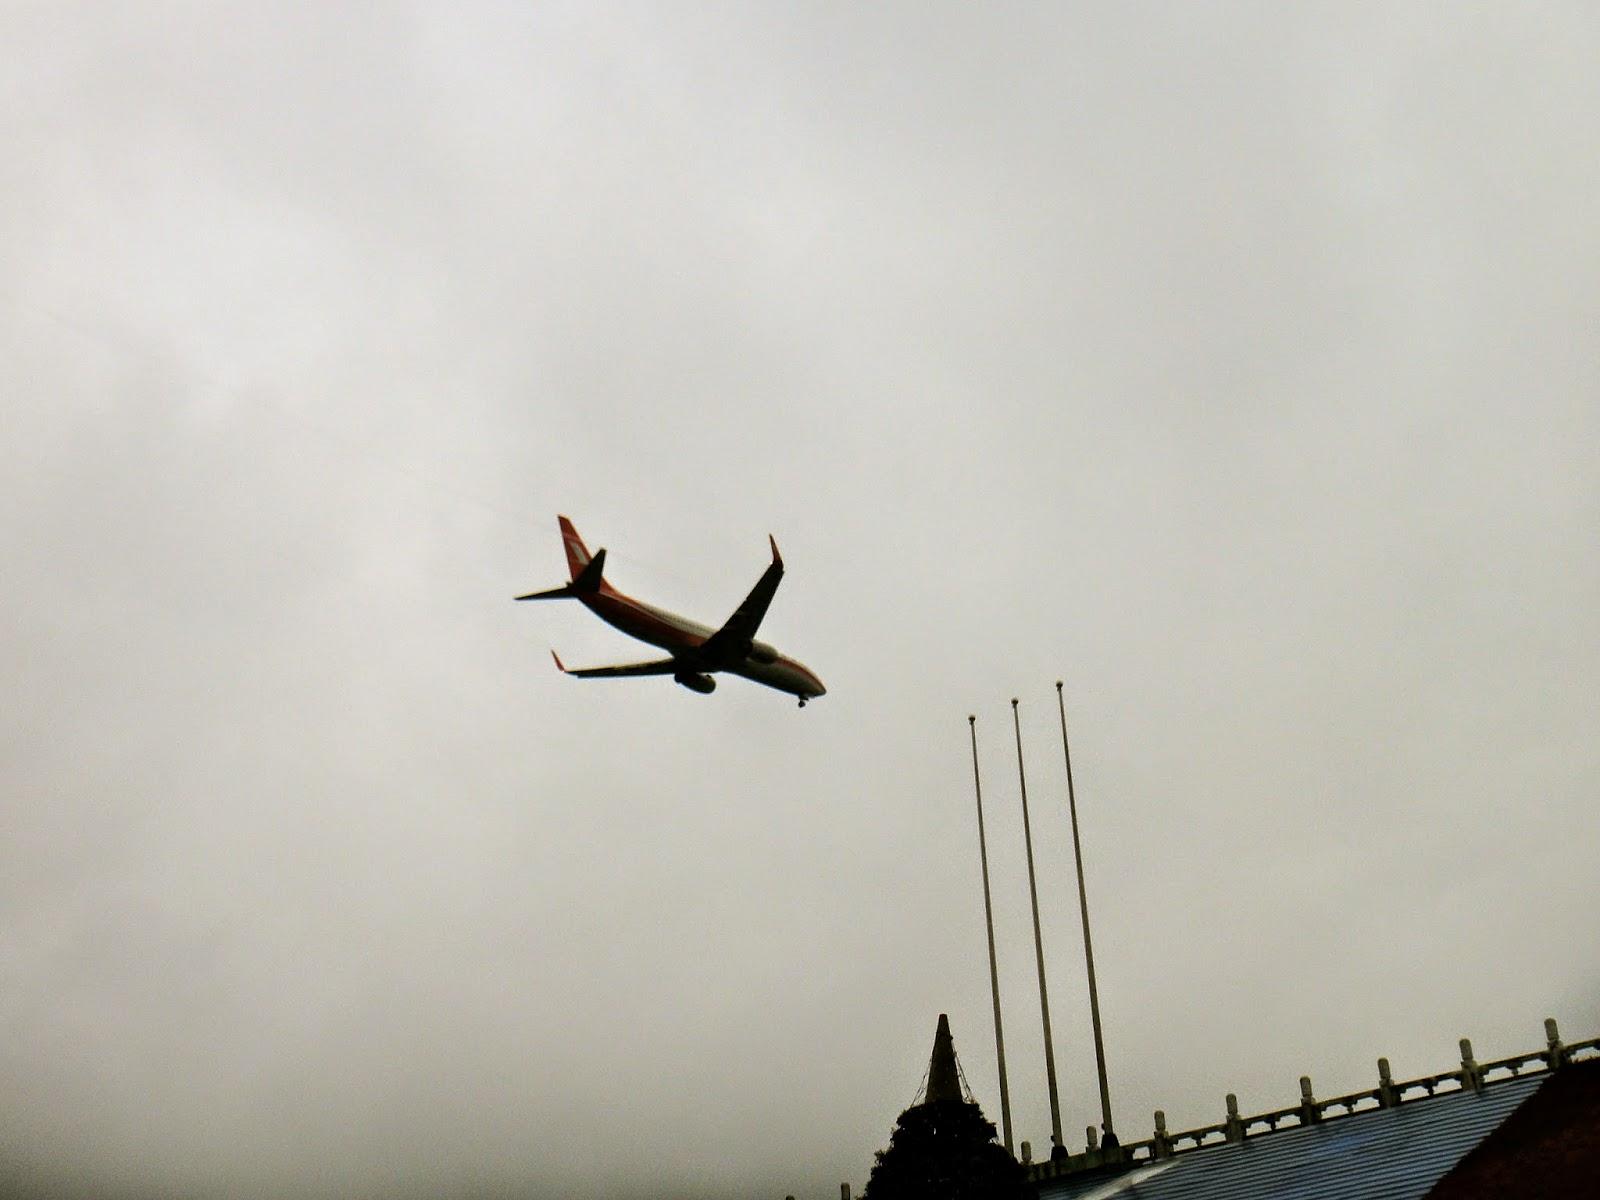 Flight from Songshan Airport Taipei